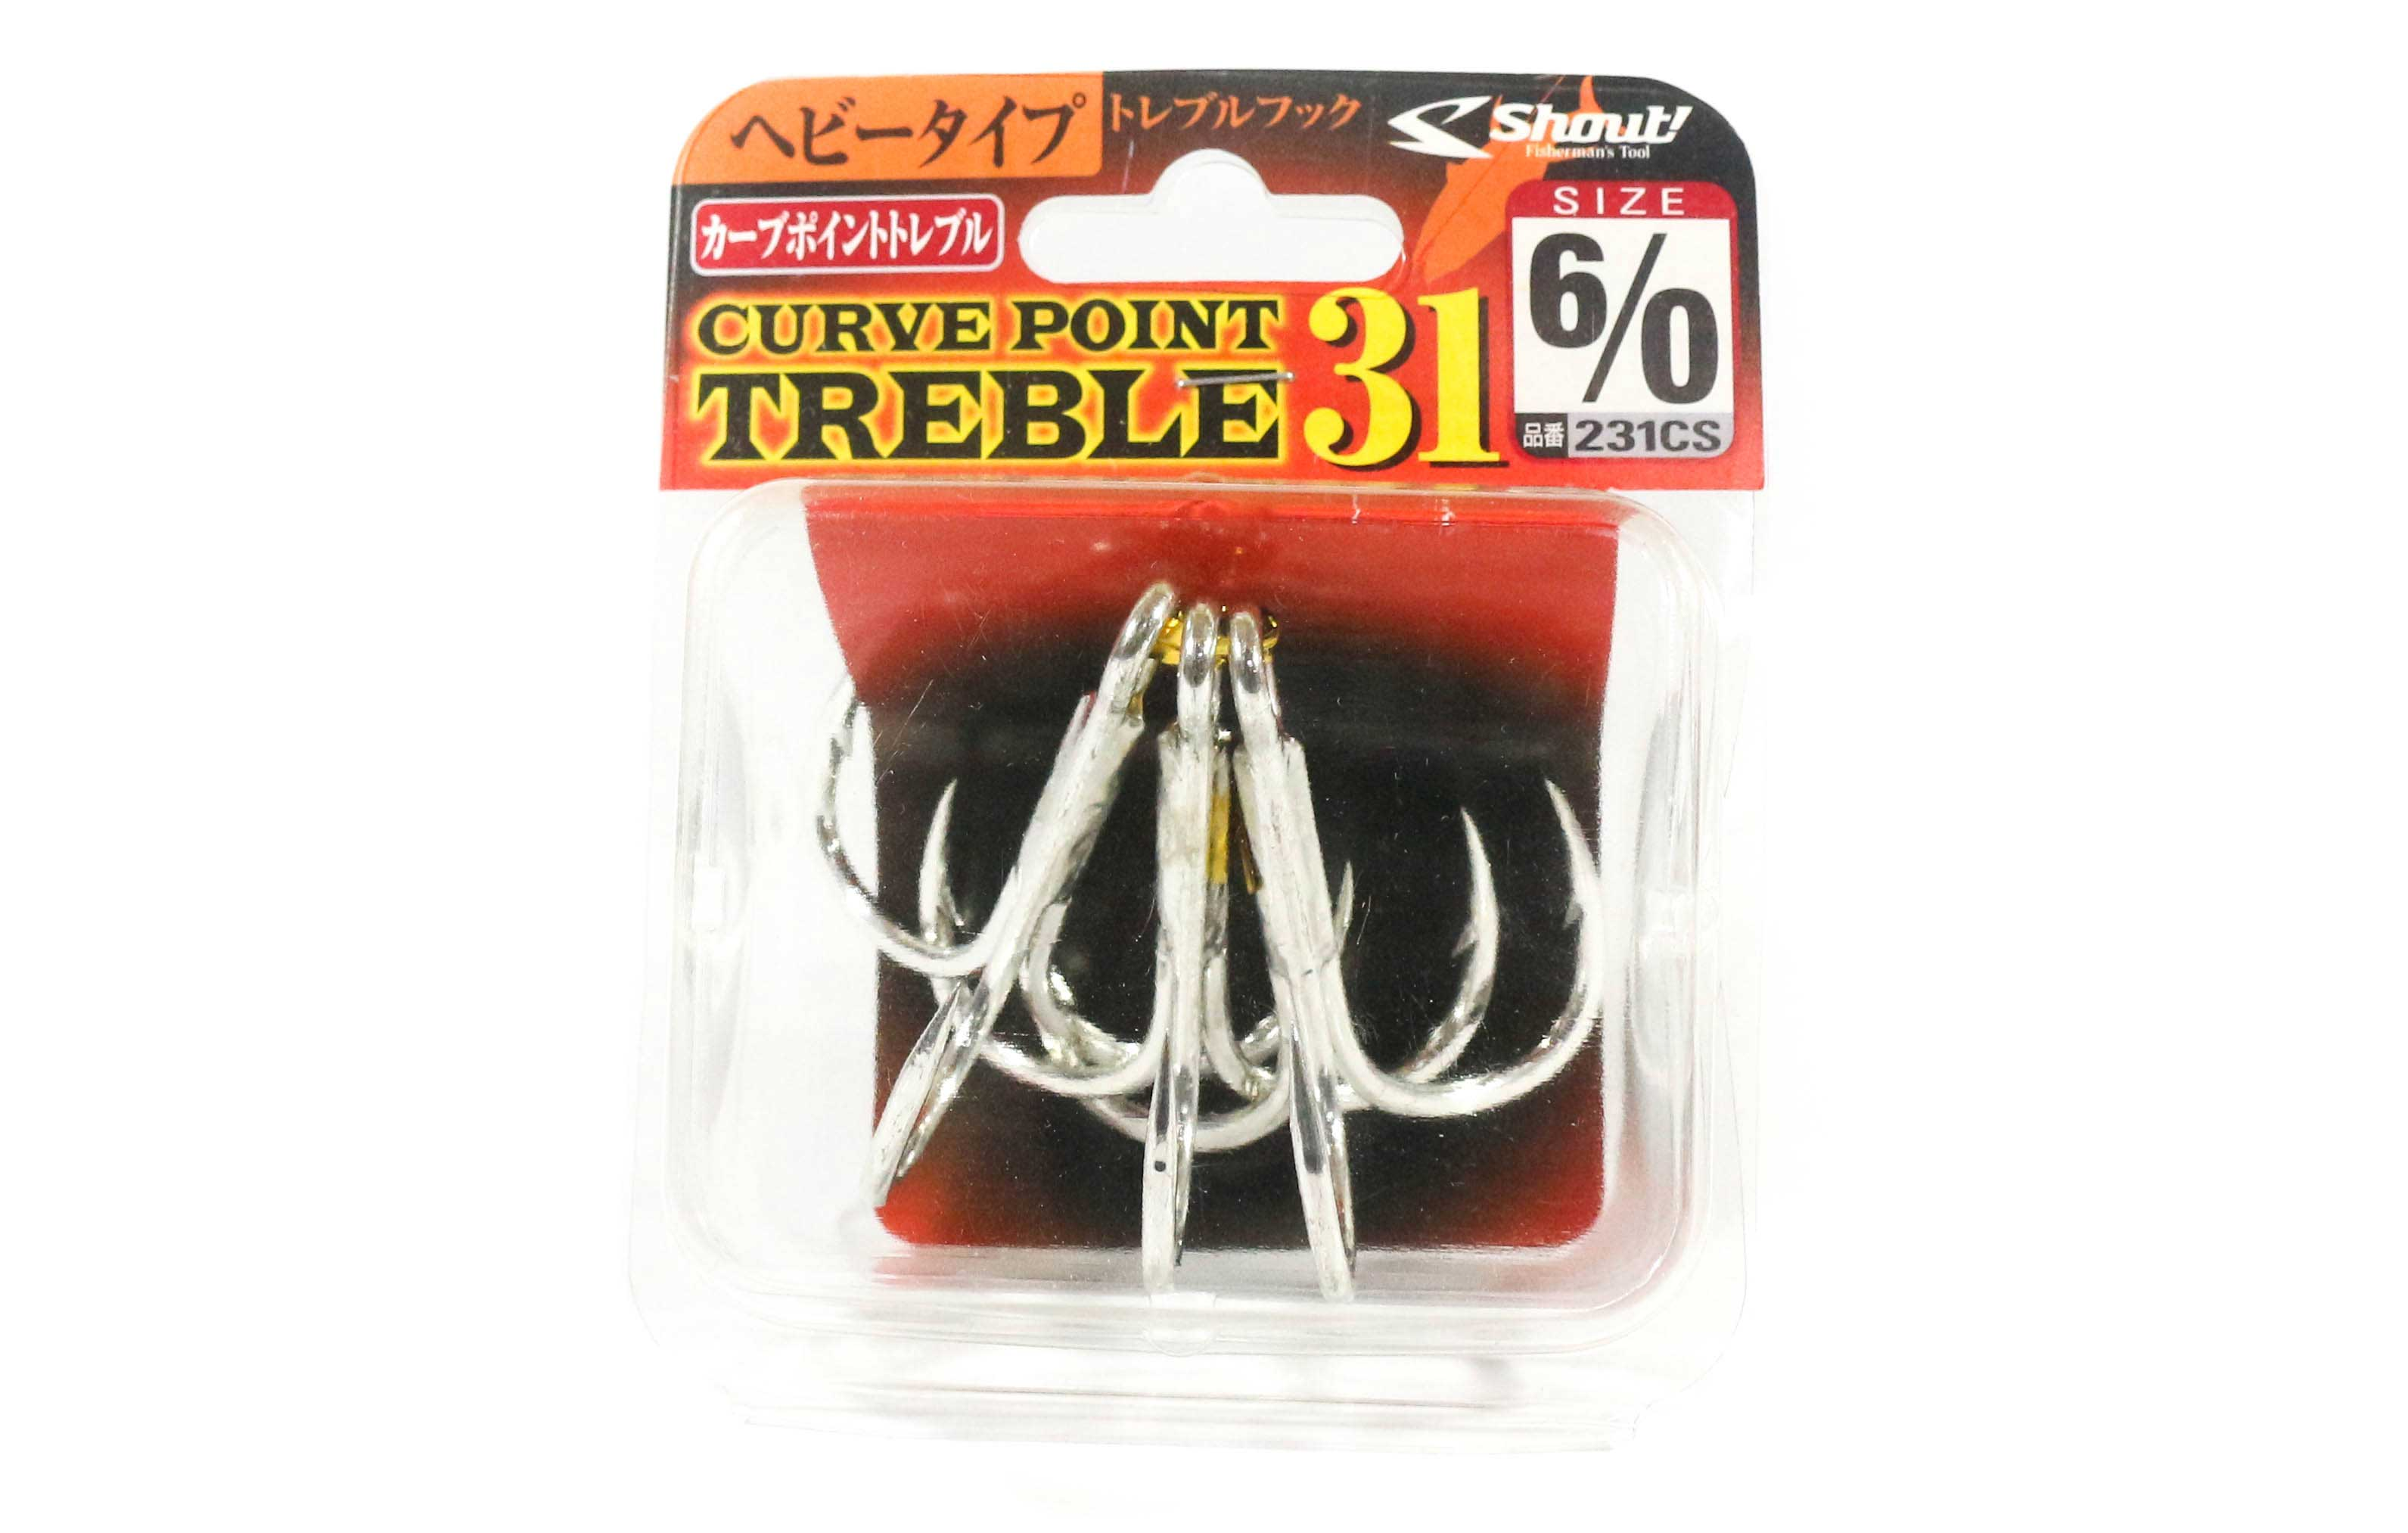 Shout 231-CS Curve Point Treble Hook Heavy Duty Size 6/0 (1597)